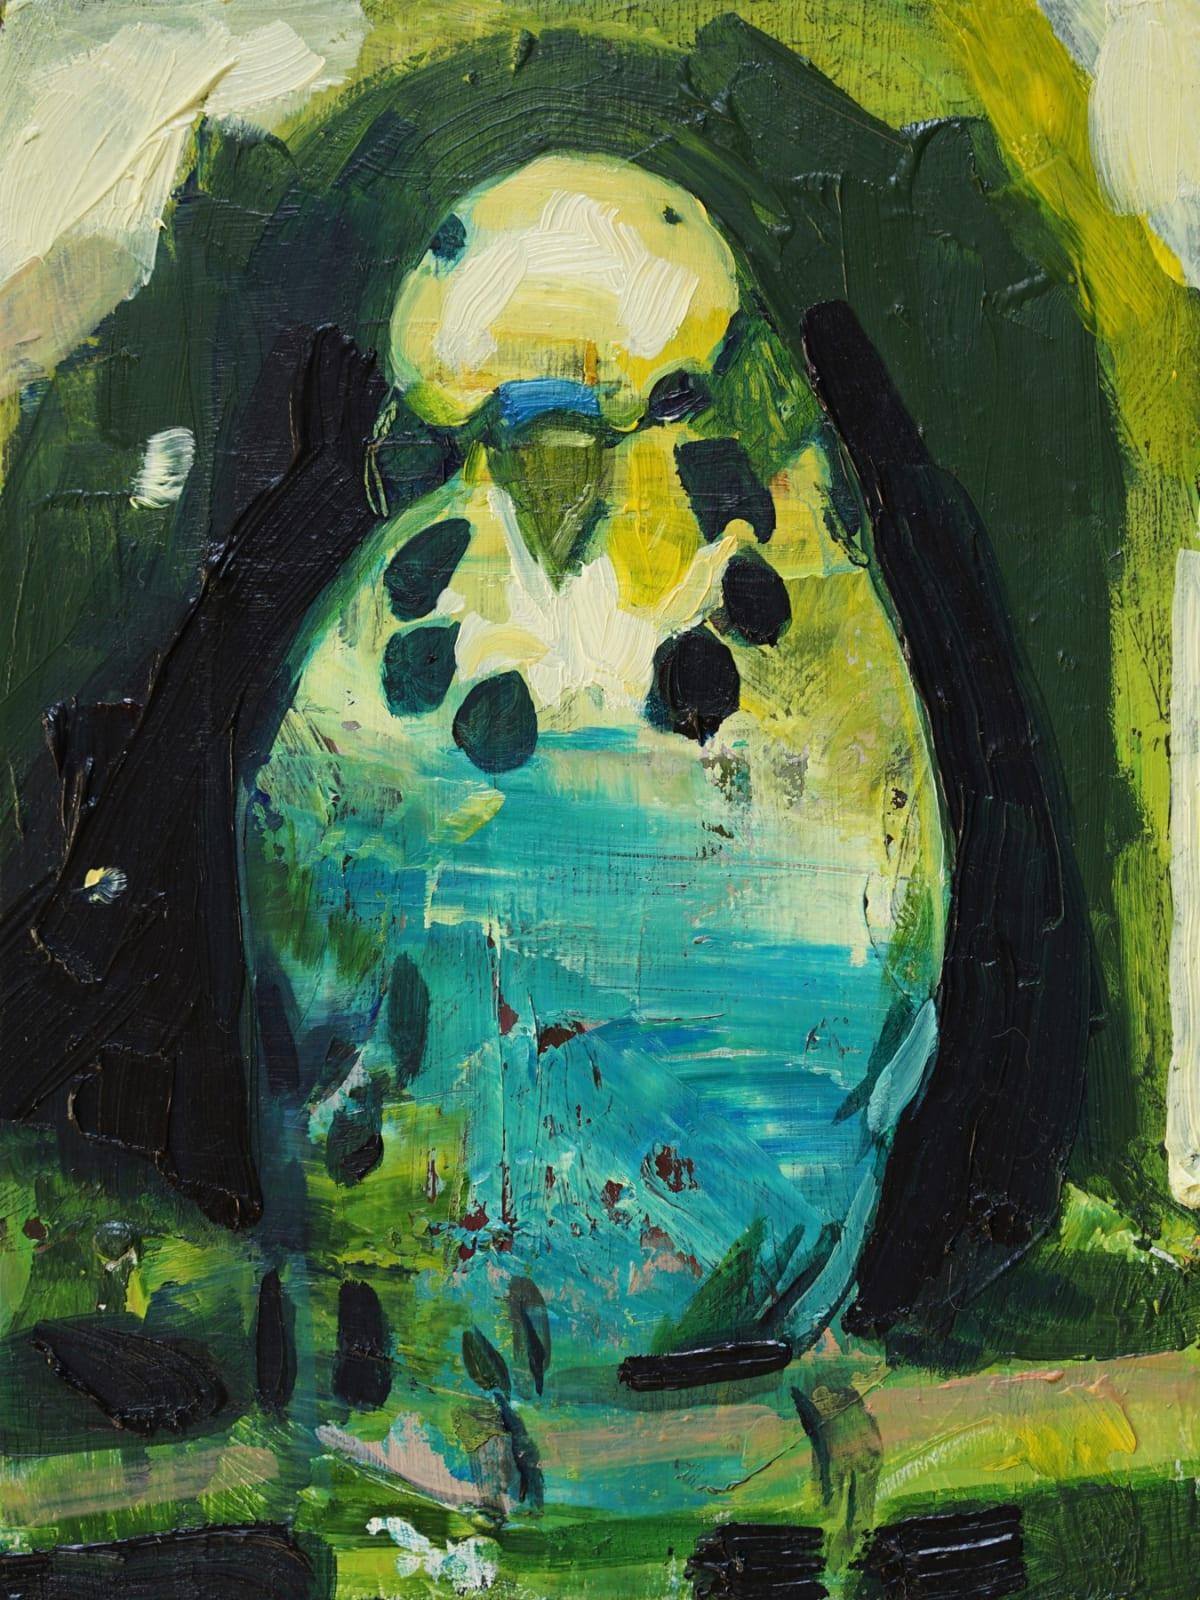 ANNA BITTERSOHL - IMAGINARY BIRD - 2017 - OIL ON WOOD - 20 X 15 CM